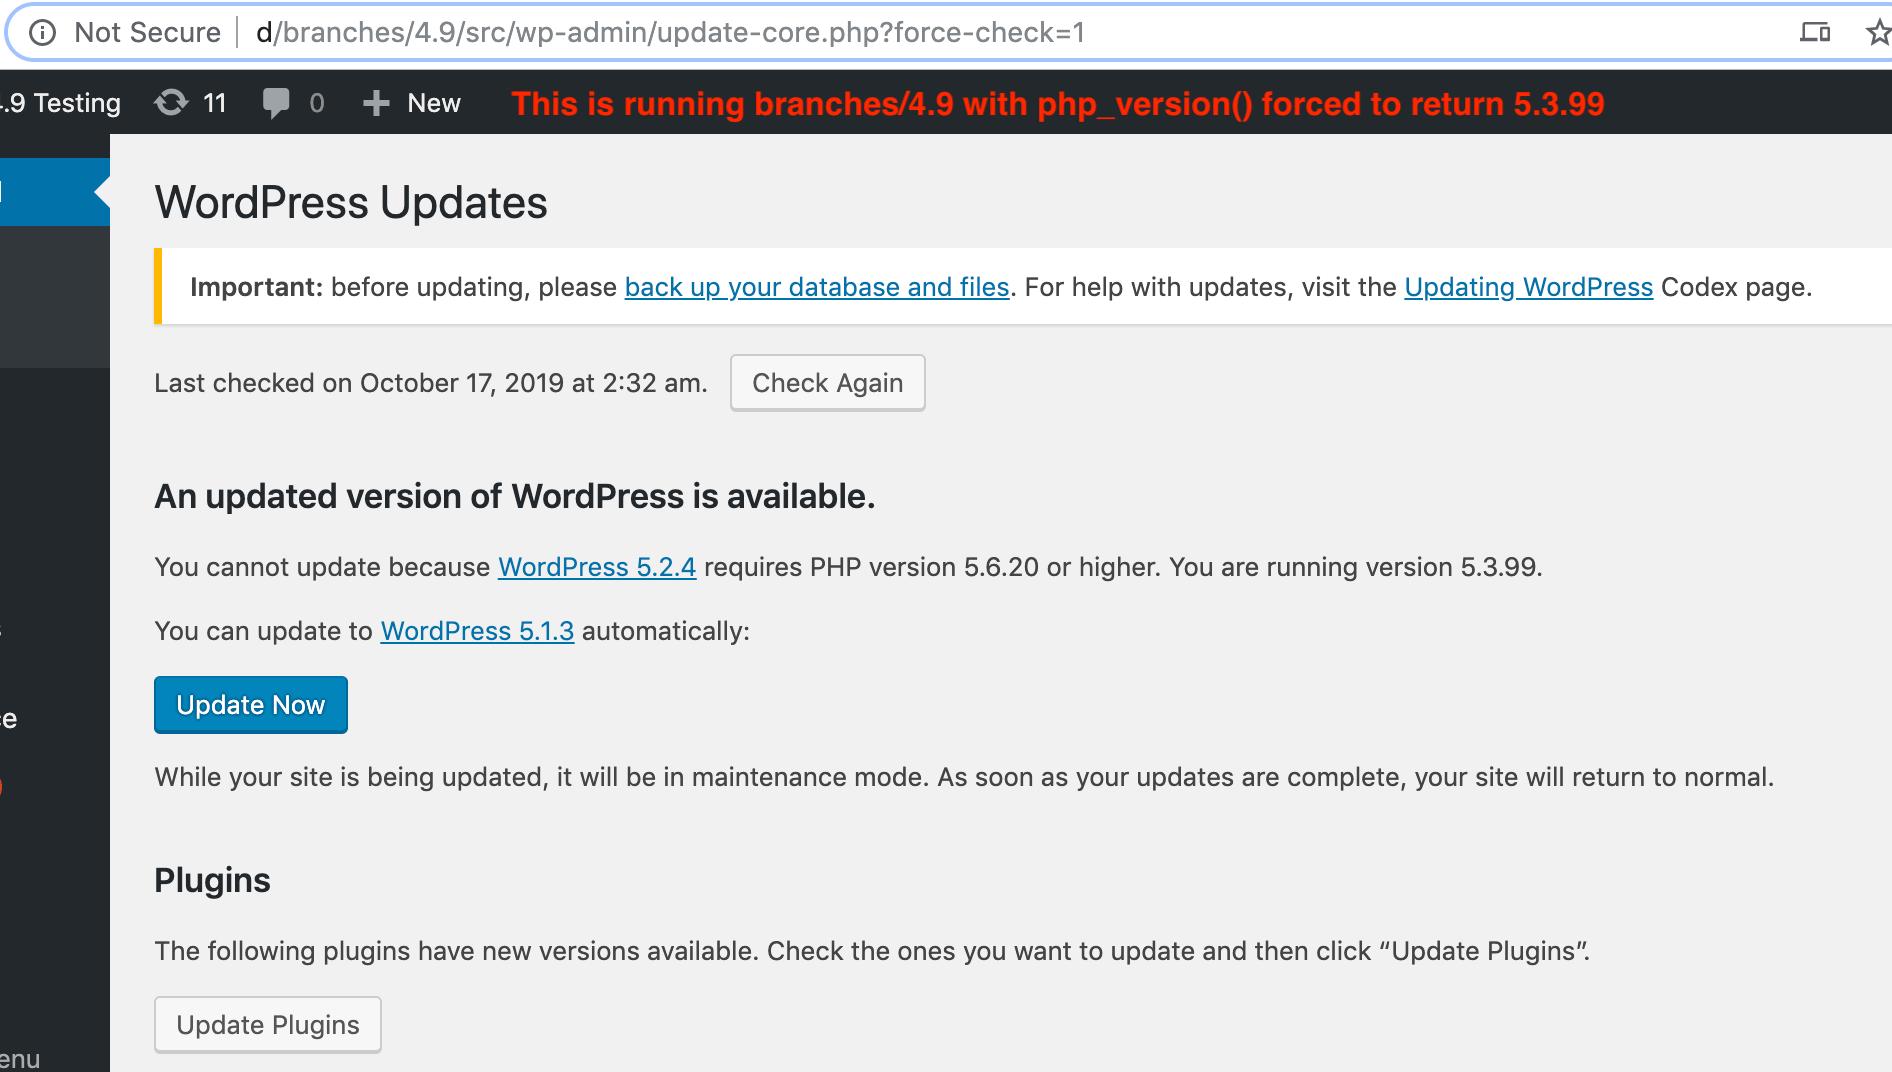 https://i0.wp.com/meta.trac.wordpress.org/raw-attachment/ticket/4699/Screen%20Shot%202019-10-17%20at%2012.33.30%20pm.png